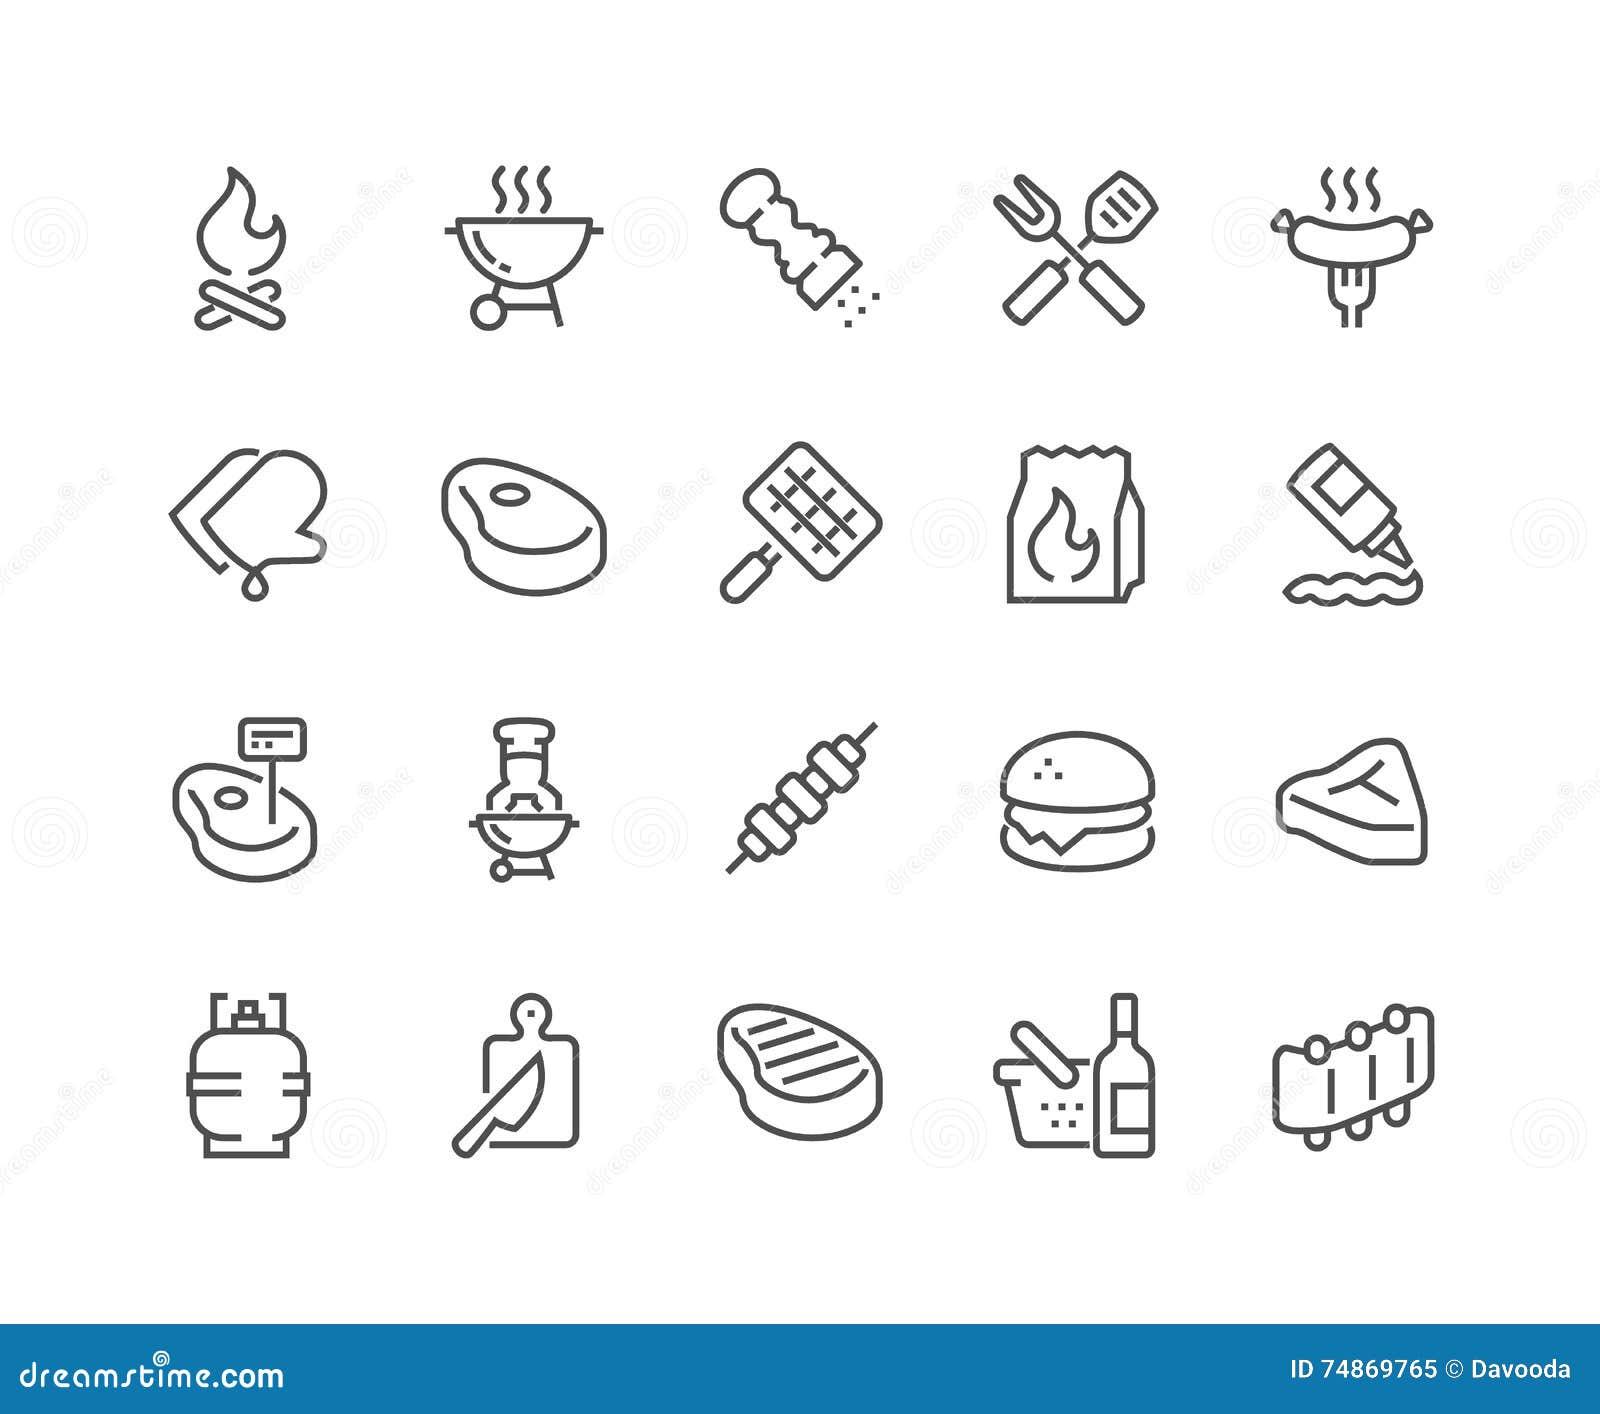 Linje grillfestsymboler